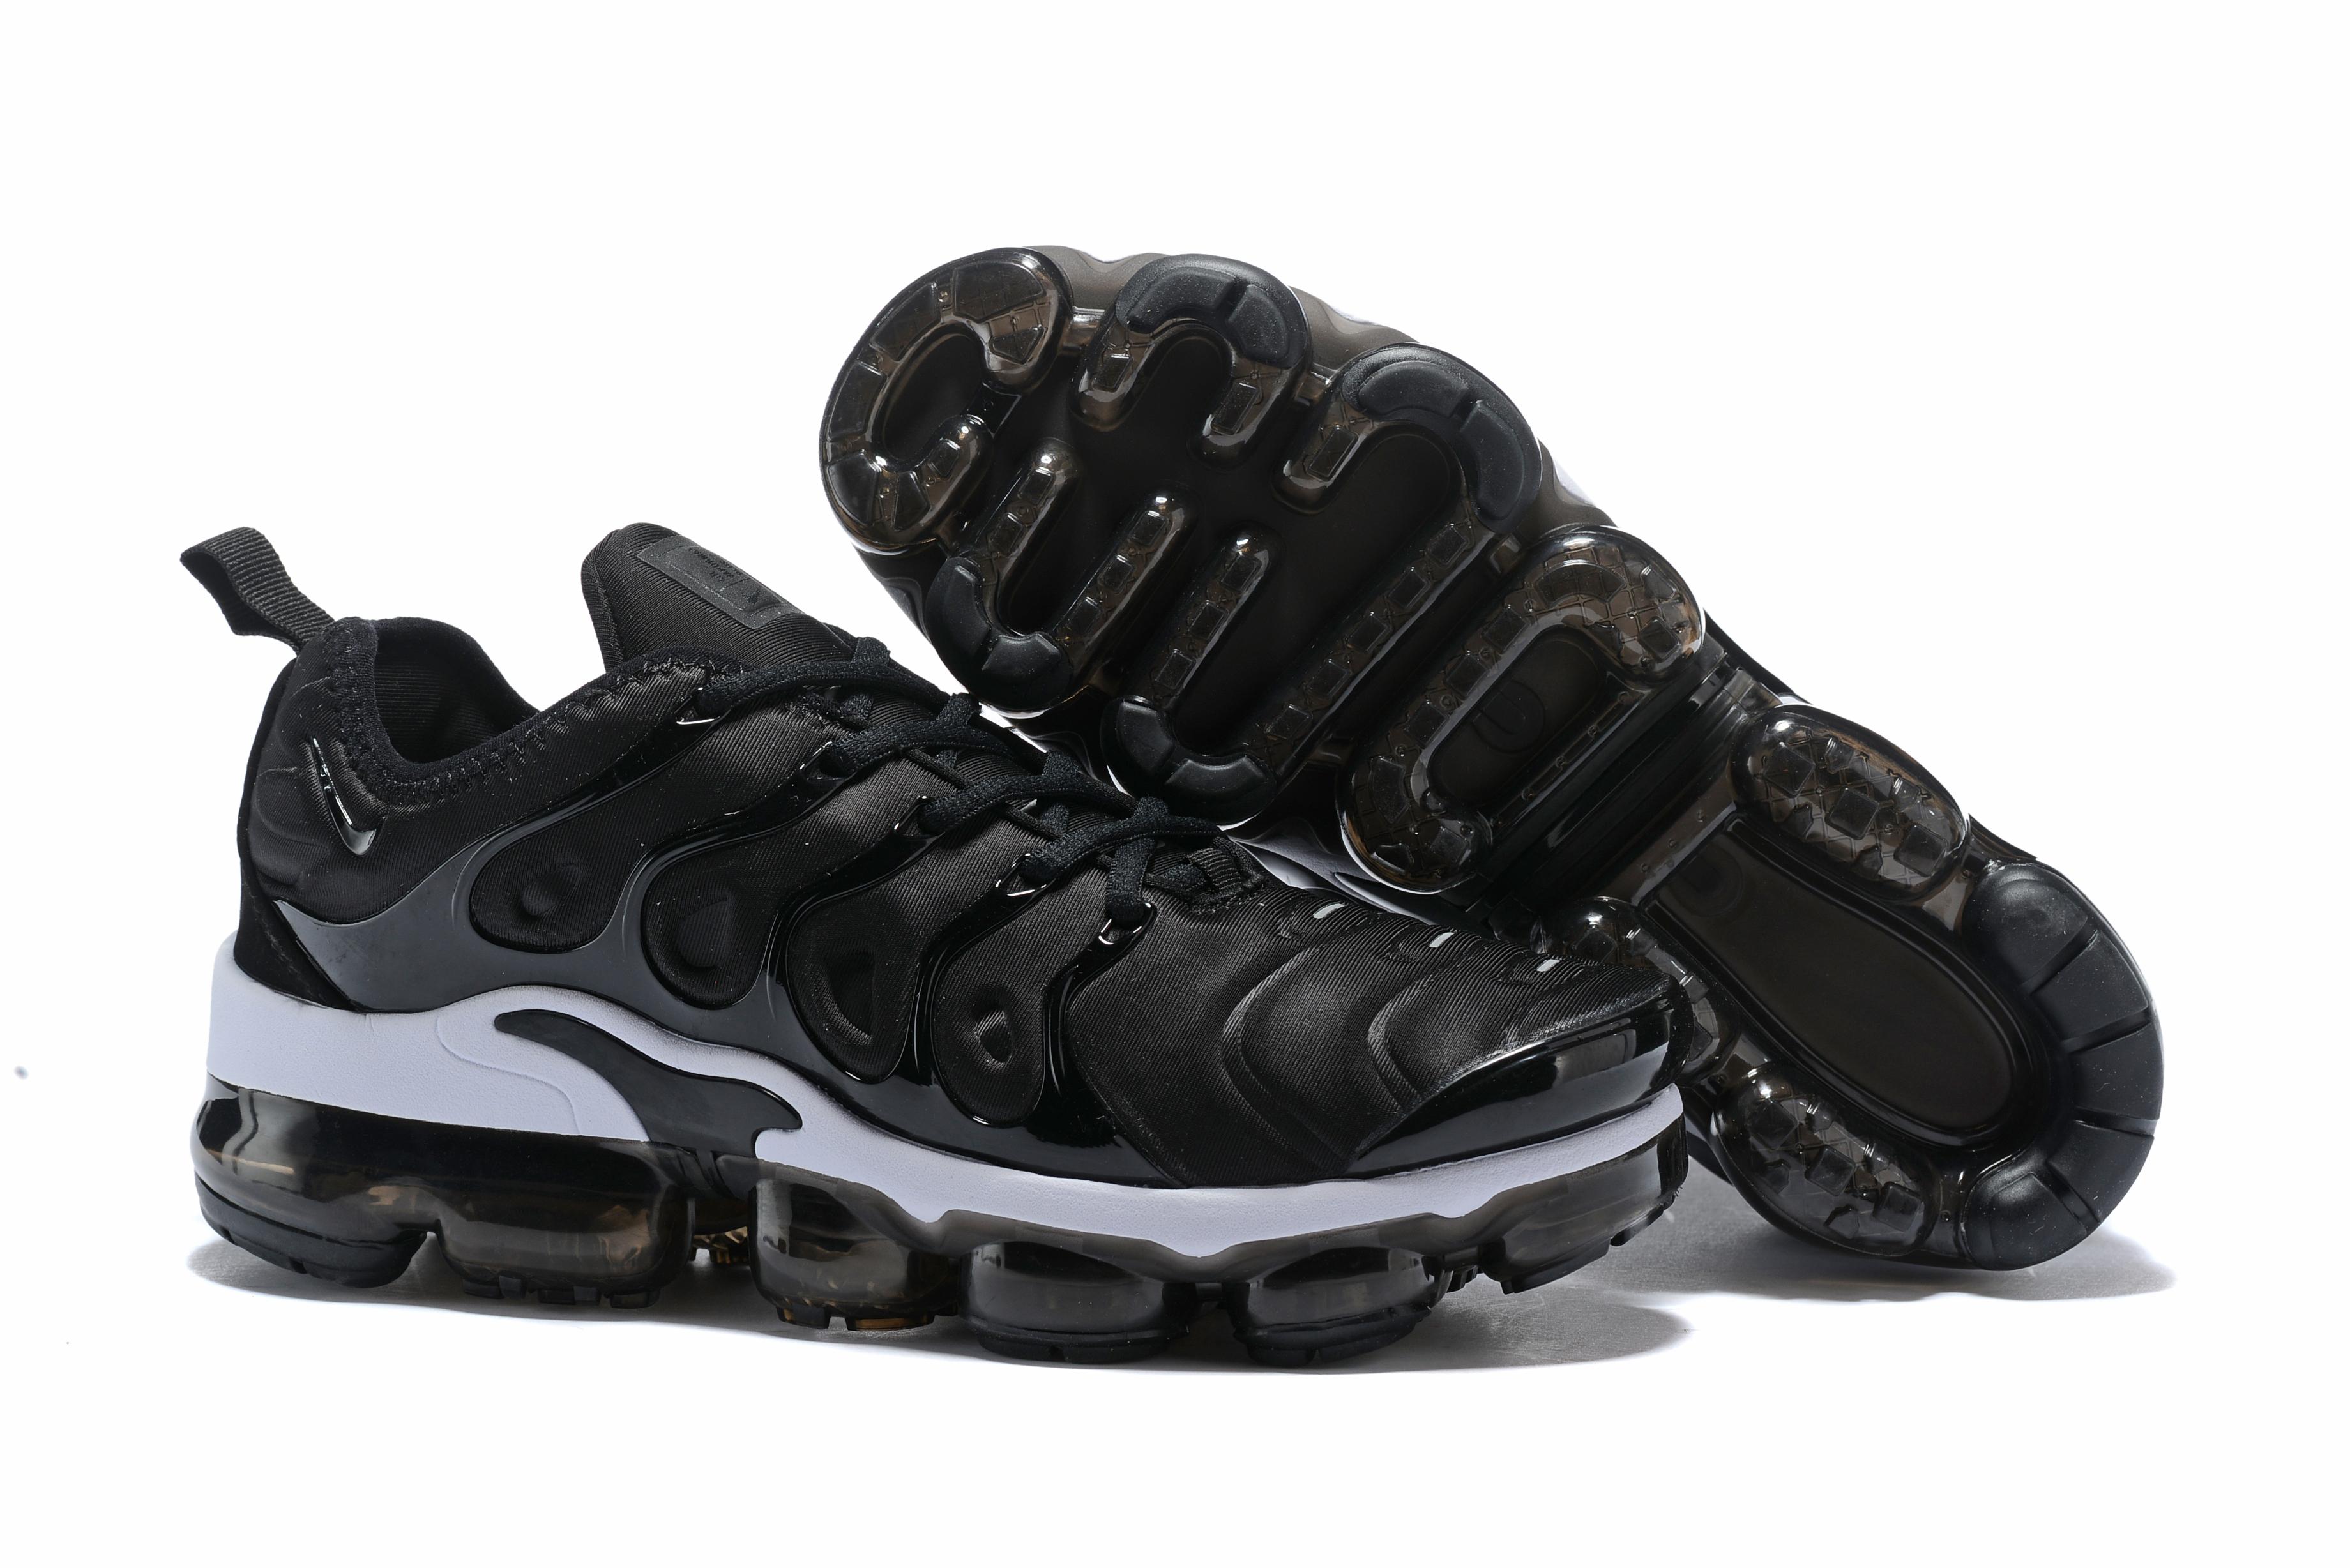 quality design fc11d e2cab Women 2018 Nike Air Max TN Plus Black White Shoes ...